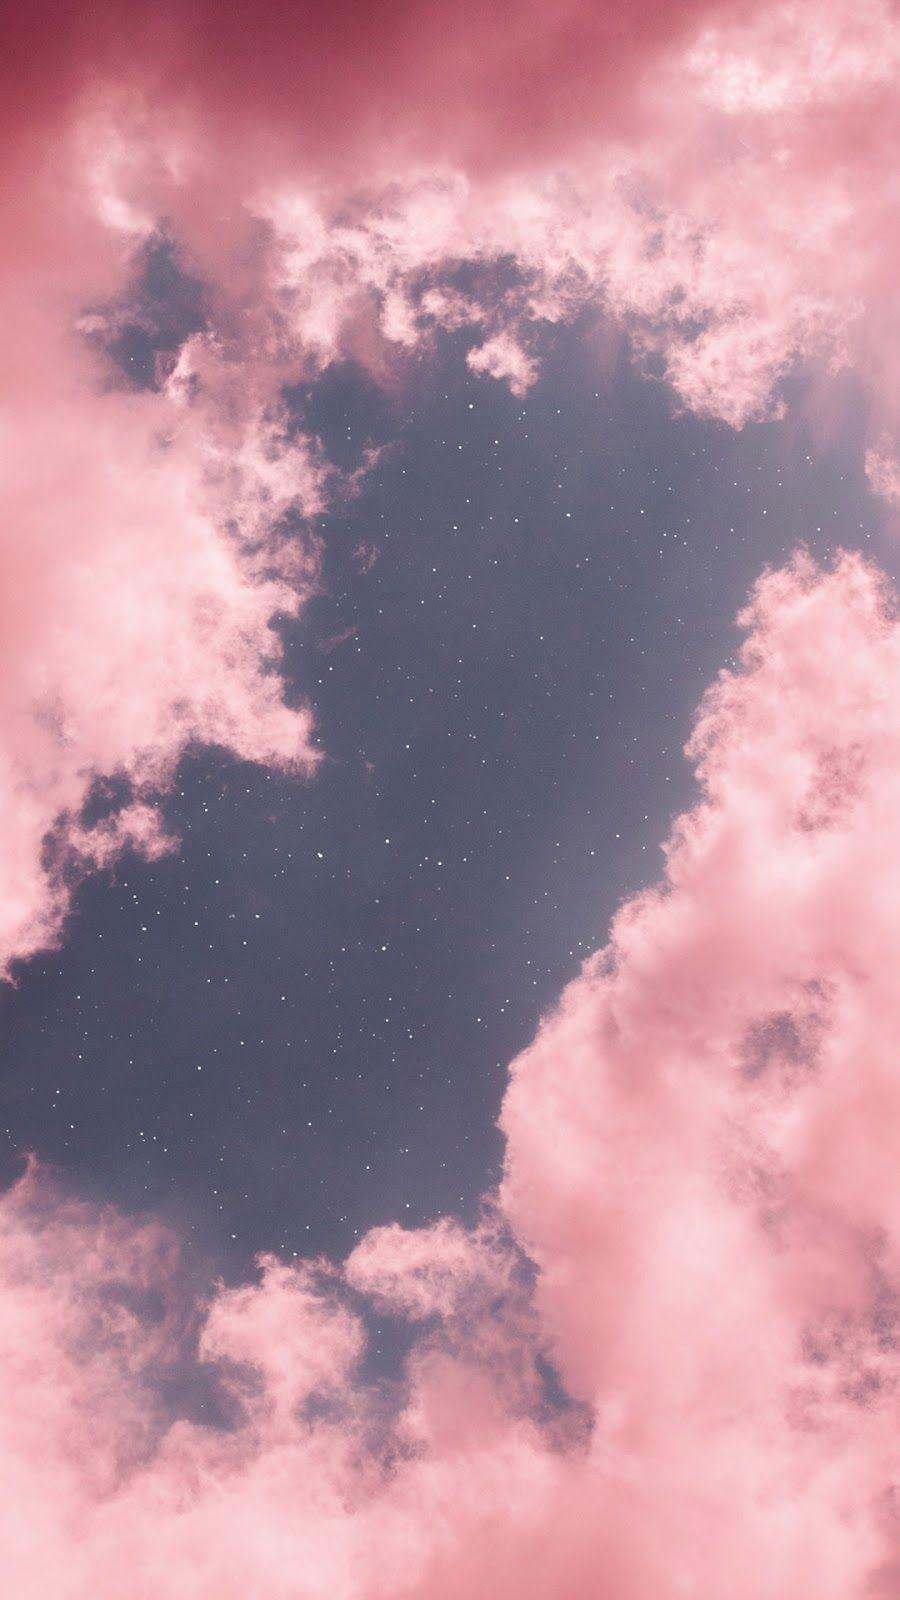 Tumblr Aesthetic Wallpaper Pink